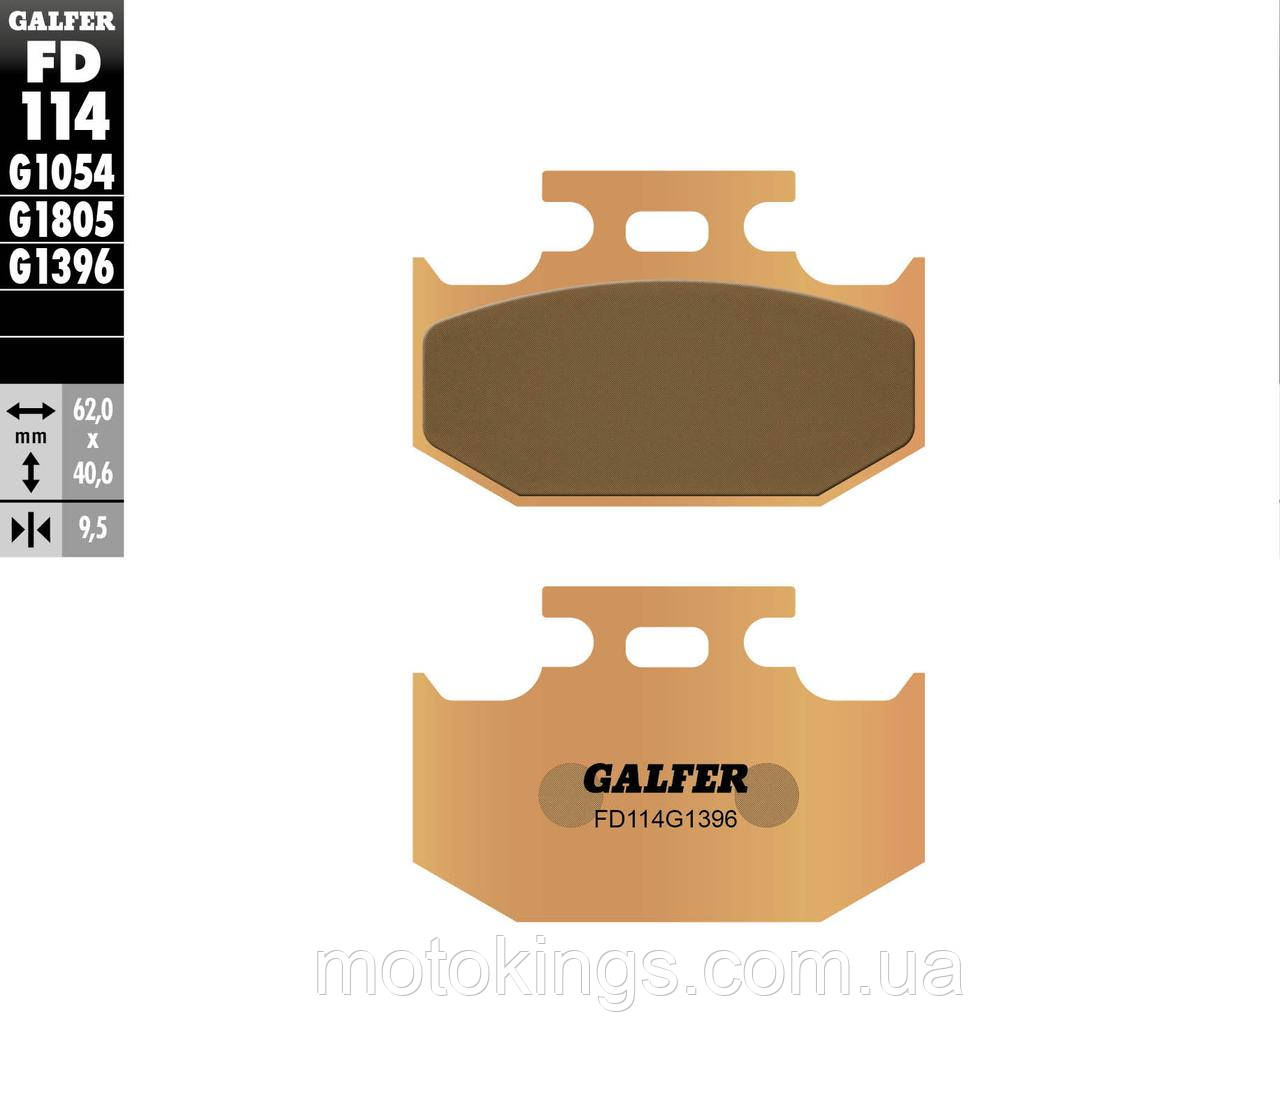 GALFER ТОРМОЗНЫЕ КОЛОДКИ    KH152  OFF ROAD (FD114G1396)